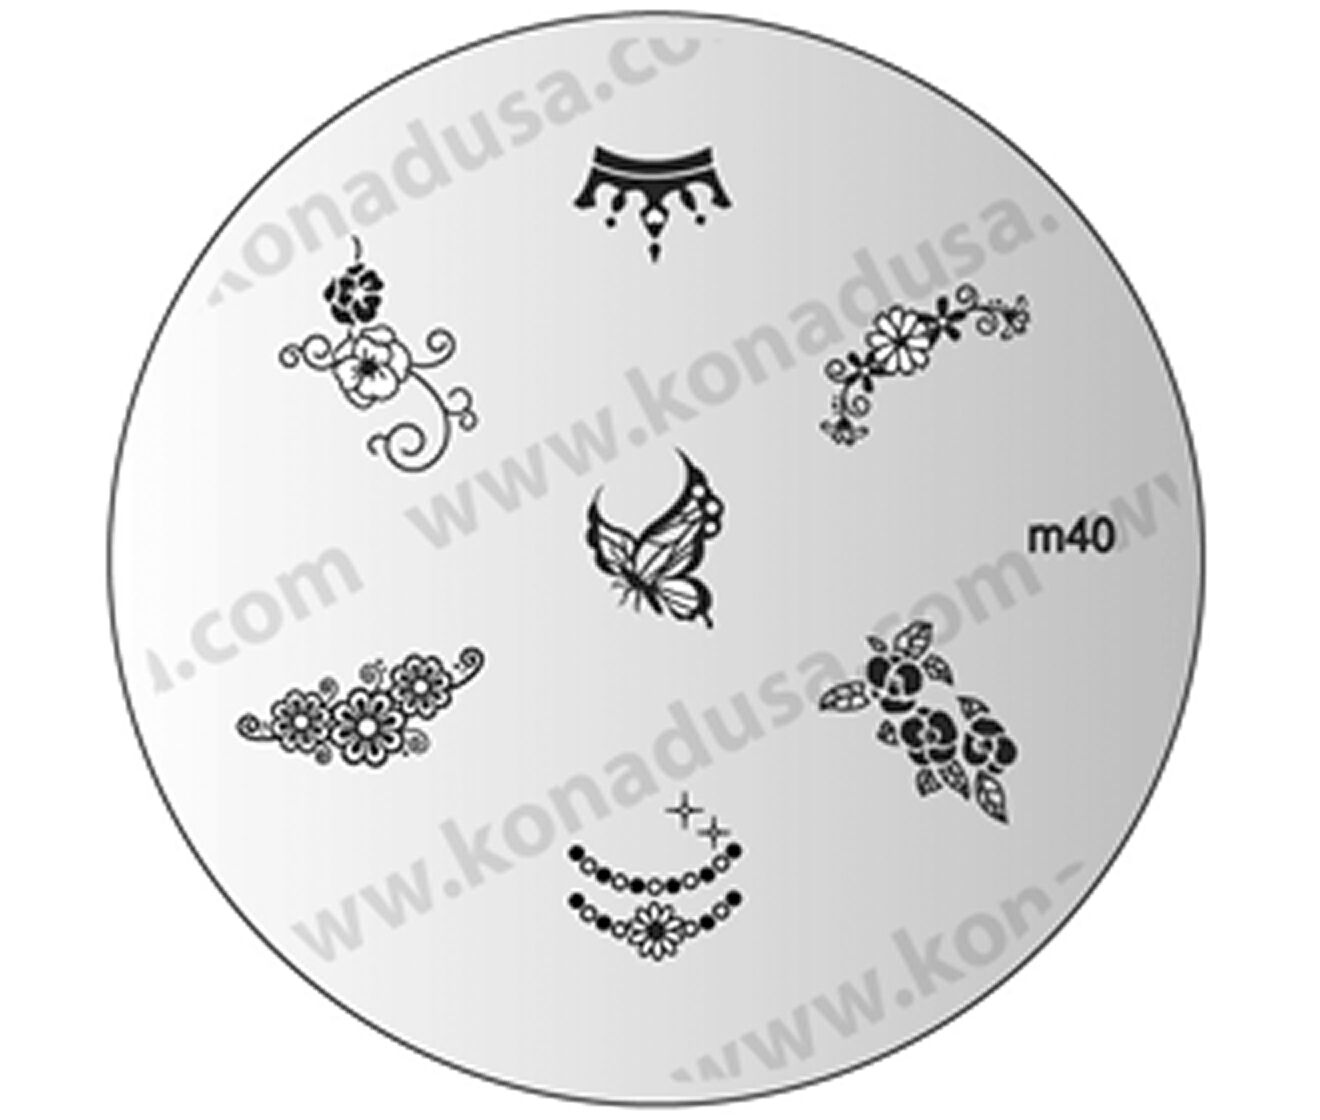 1 Image Plate M40 KONAD Stamping Nail Art Design Nails   eBay